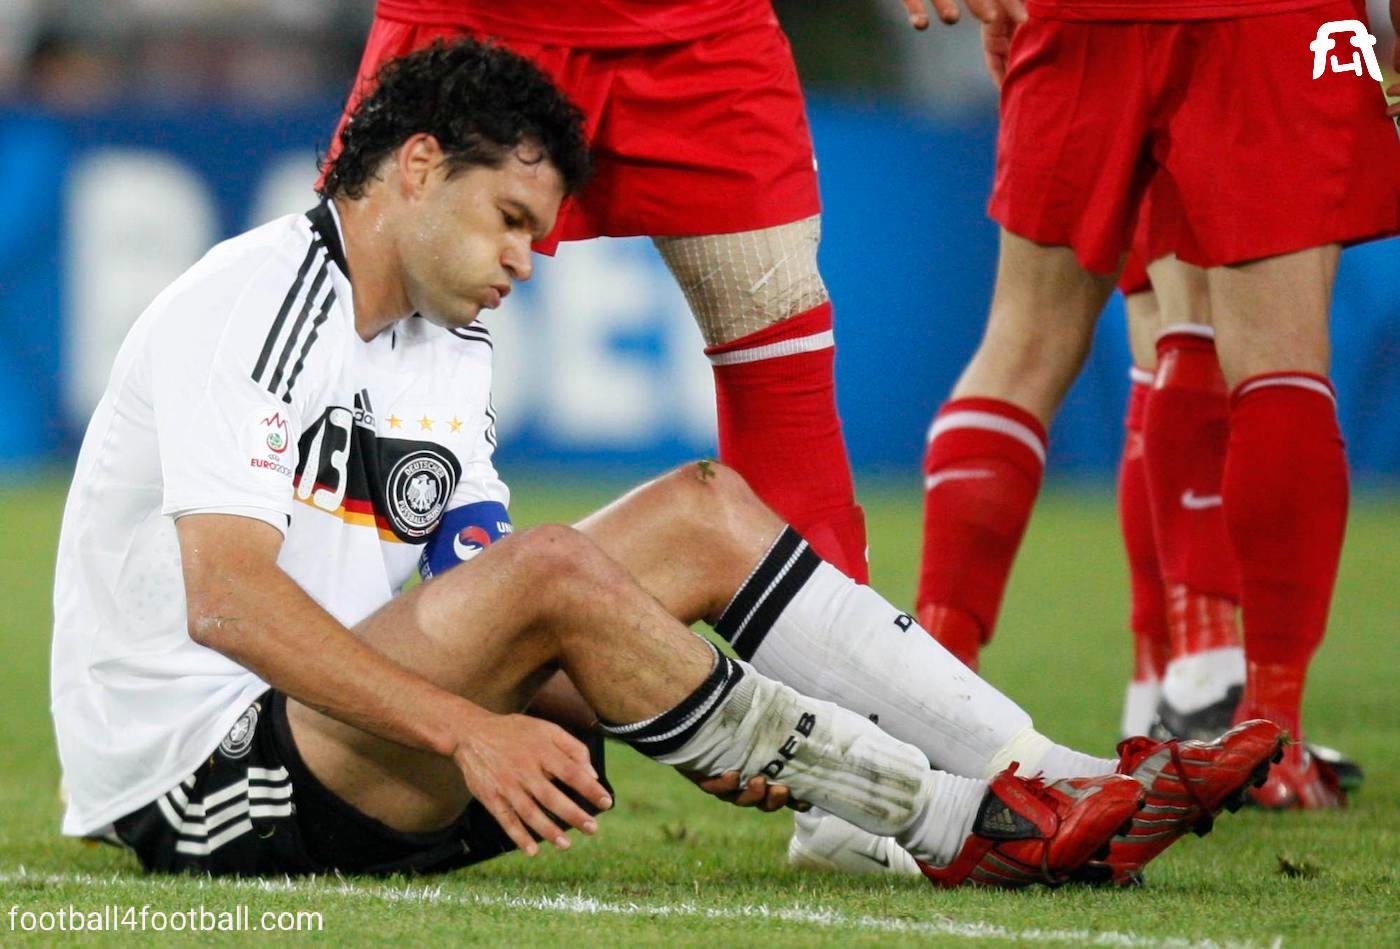 http://football4football.com/storage/img/articleimages/originals/sjRcbf7gouGIyBgFKRoc1SikpuLiJTVBqaM.jpg